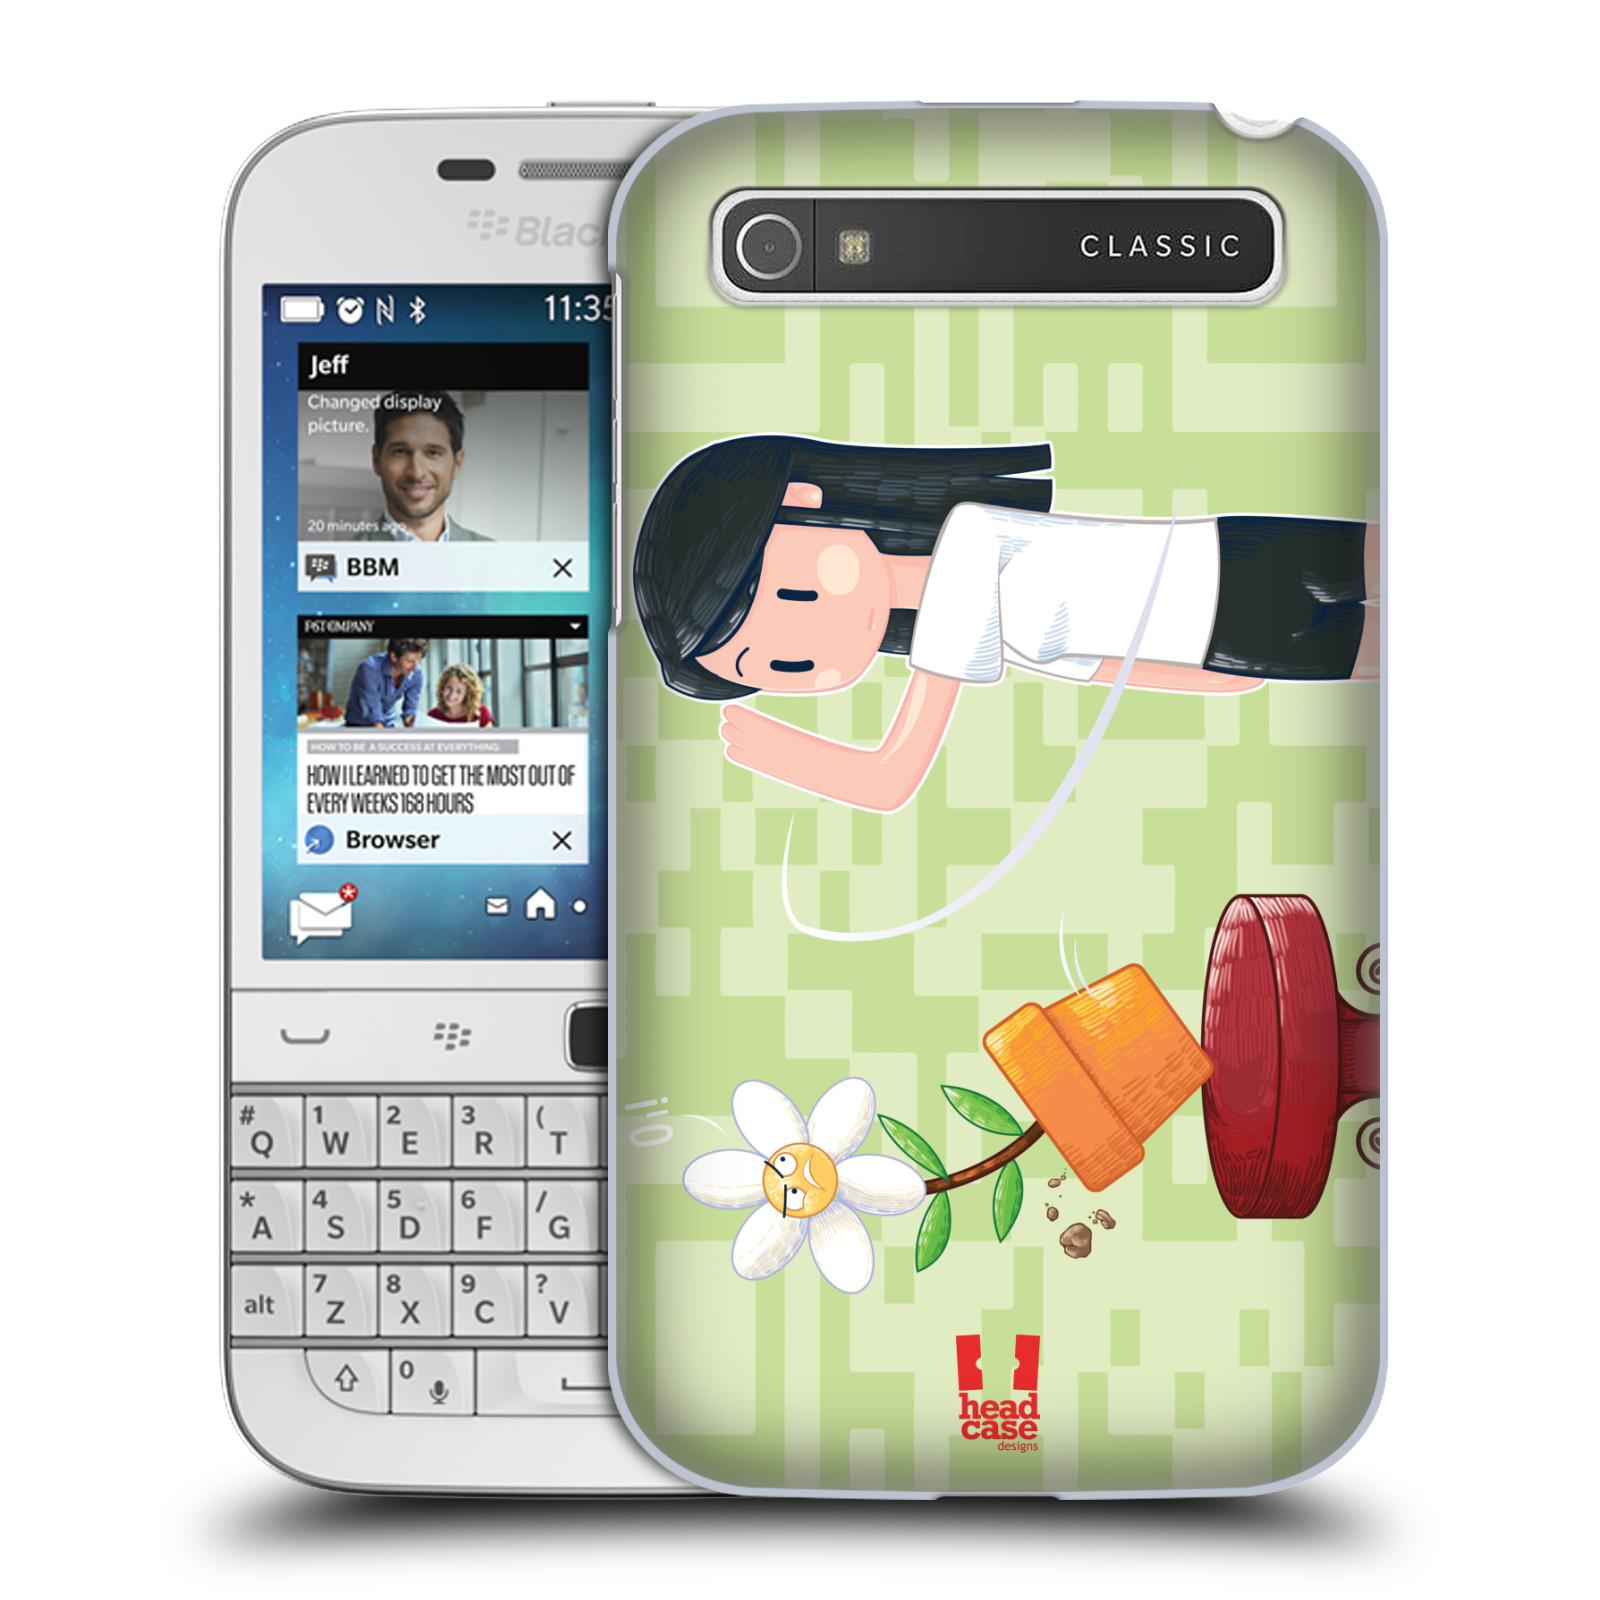 HEAD-CASE-DESIGNS-WUT-HARD-BACK-CASE-FOR-BLACKBERRY-PHONES